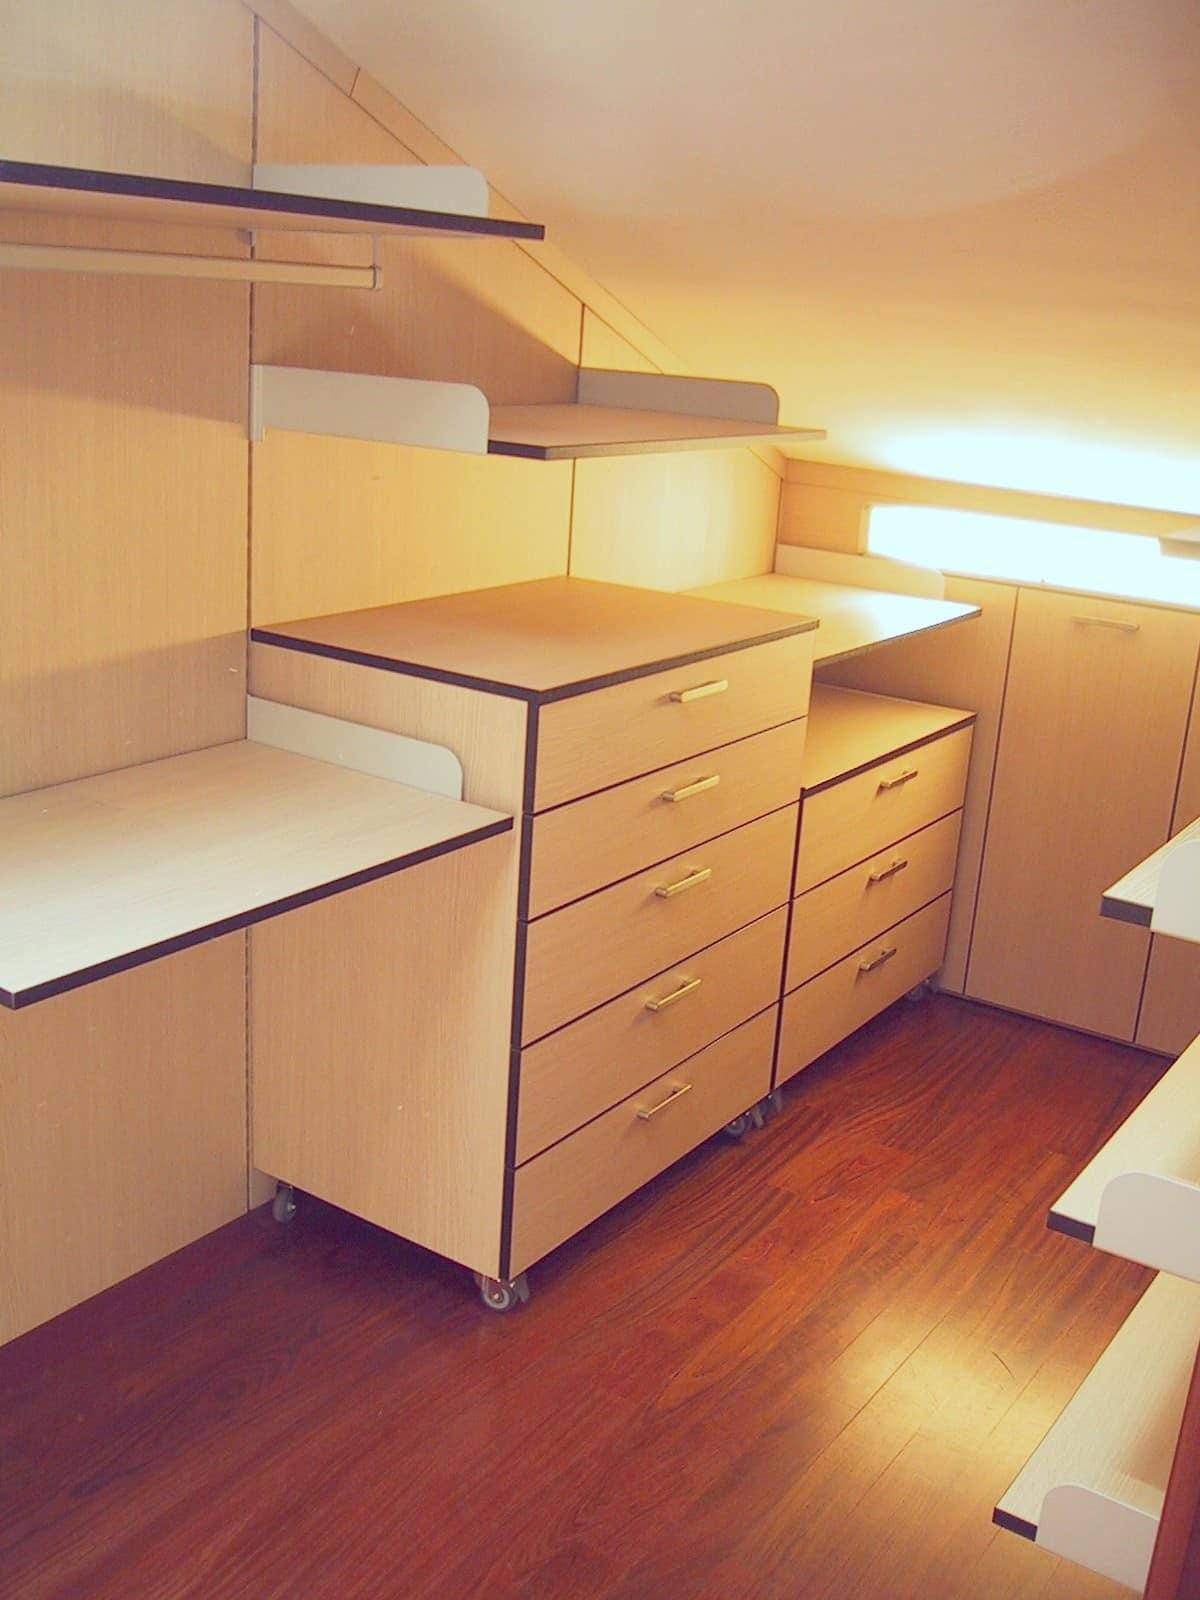 Cabina armadio in mansarda su misura idfdesign for Arredo cabina armadio